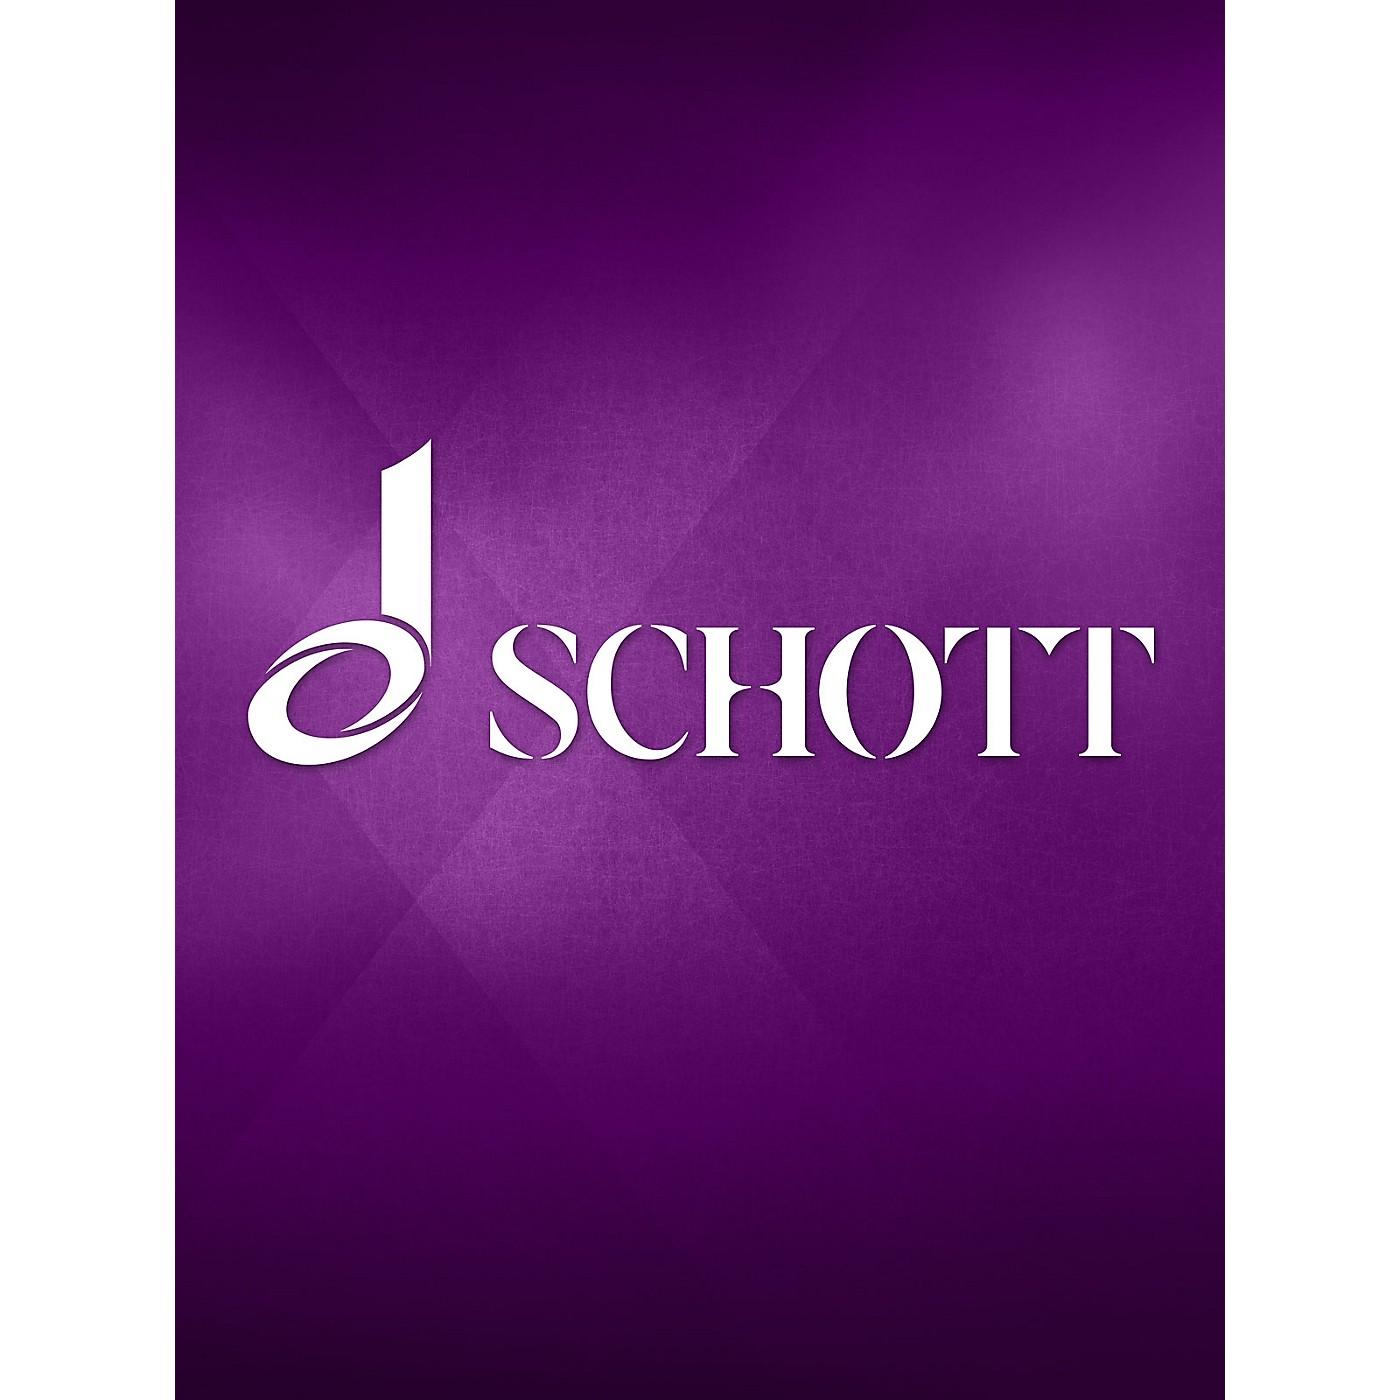 Schott Concerto D Major (Violin and Piano Reduction) Schott Series thumbnail